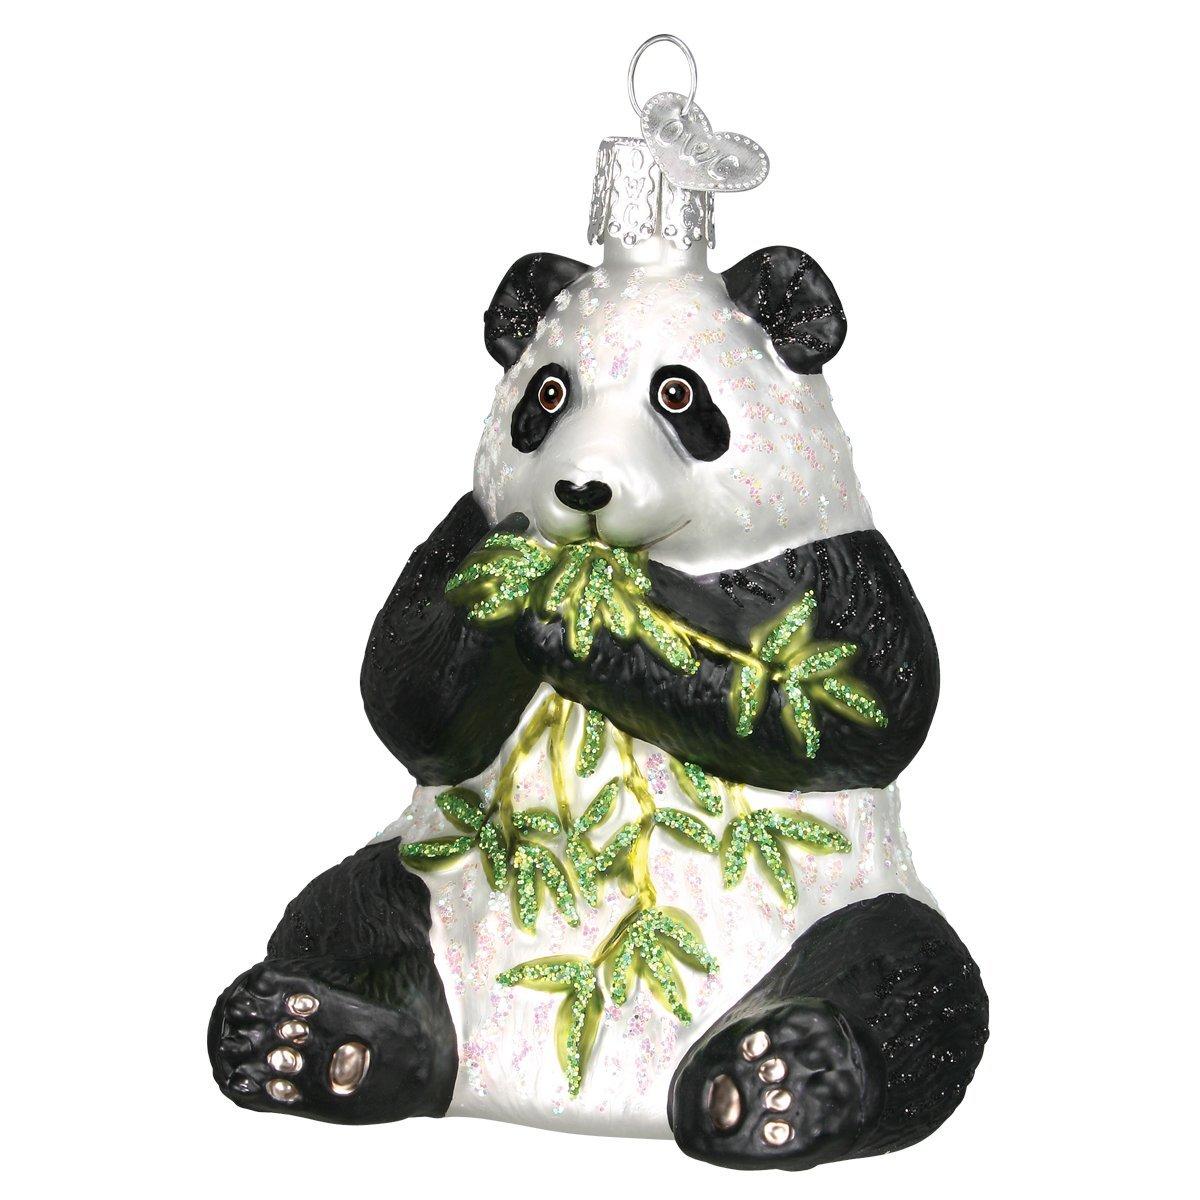 Amazon.com: Old World Christmas Panda Glass Blown Ornament: Home U0026 Kitchen